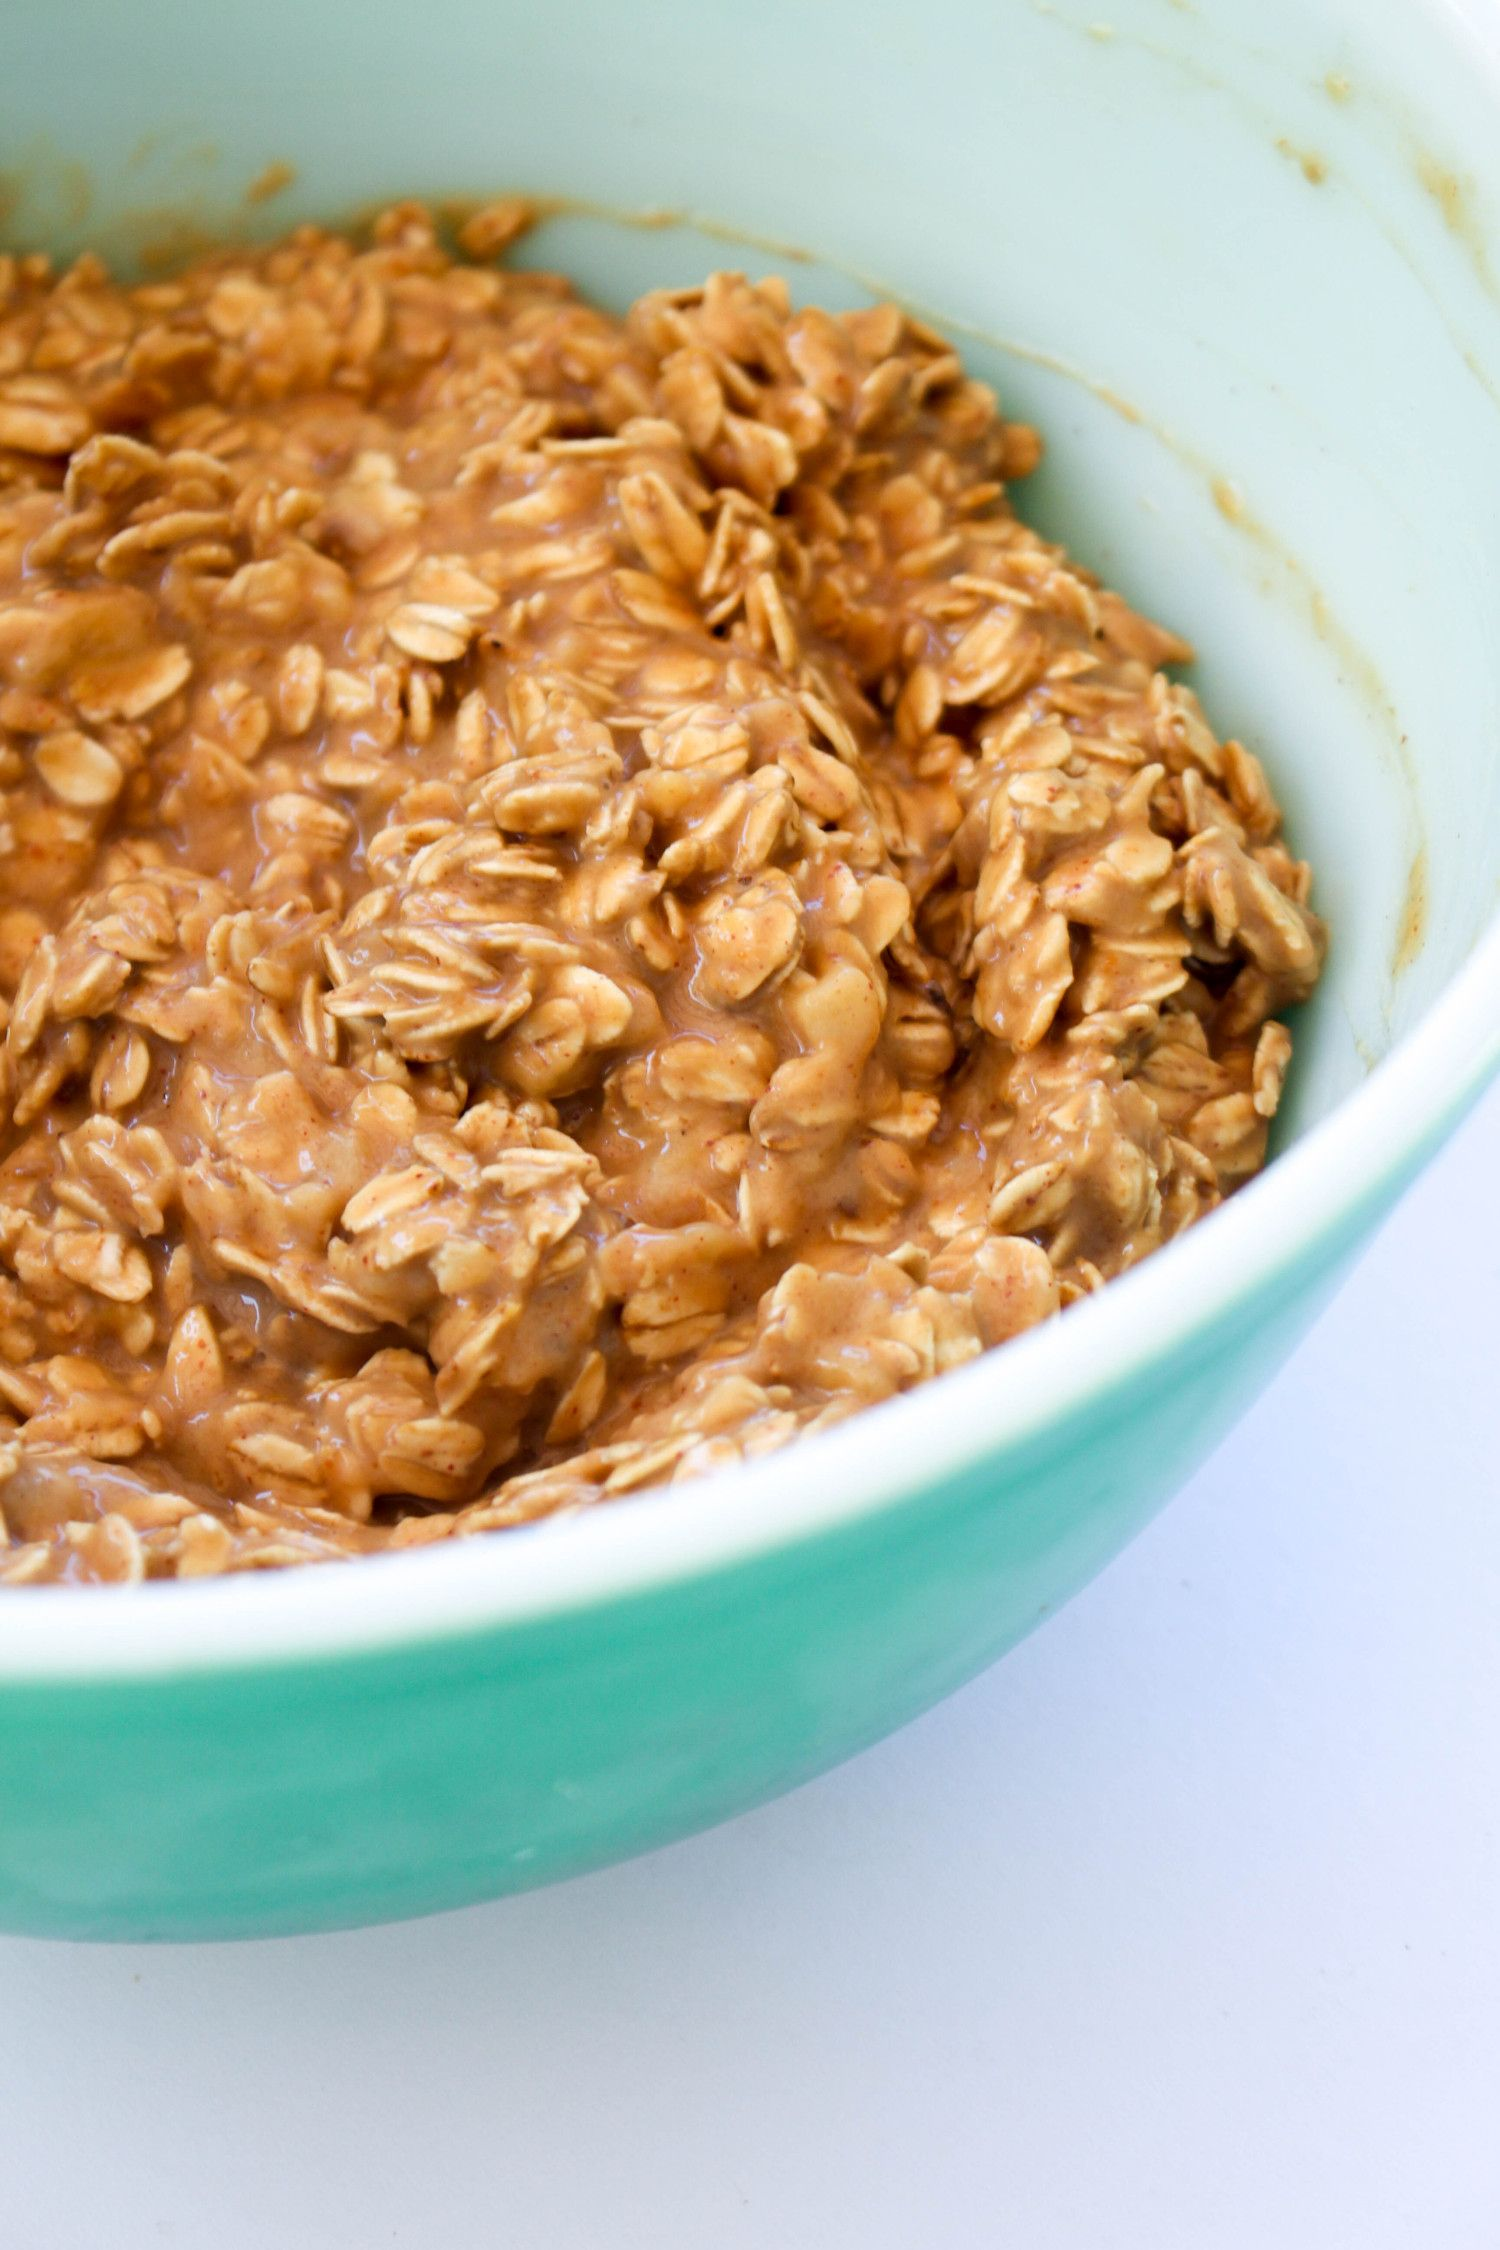 Peanut butter banana breakfast cookies m